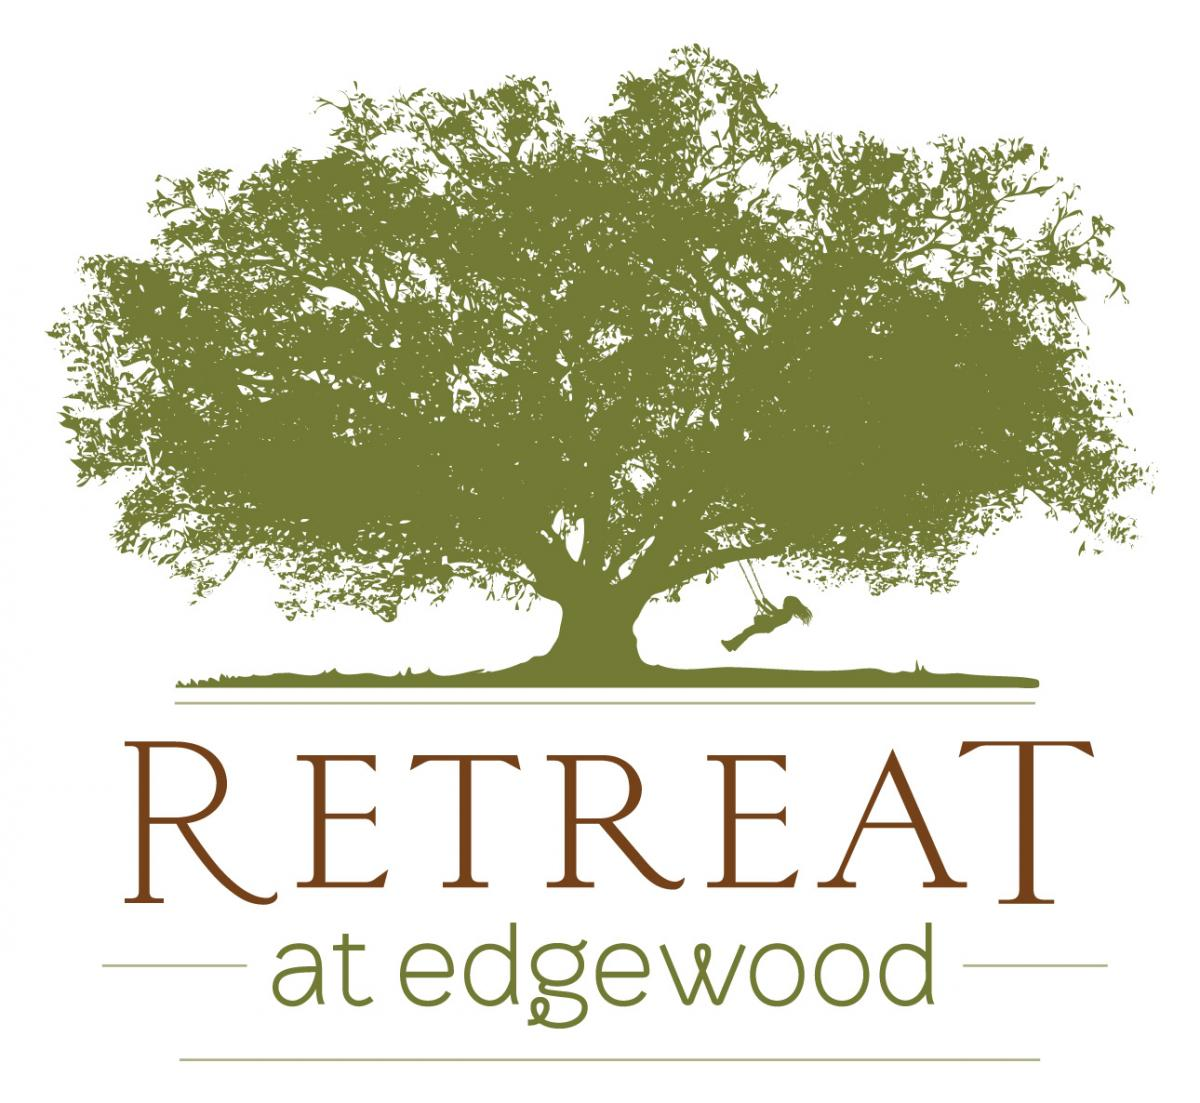 Retreat Apartments: The Zeist Foundation, Inc